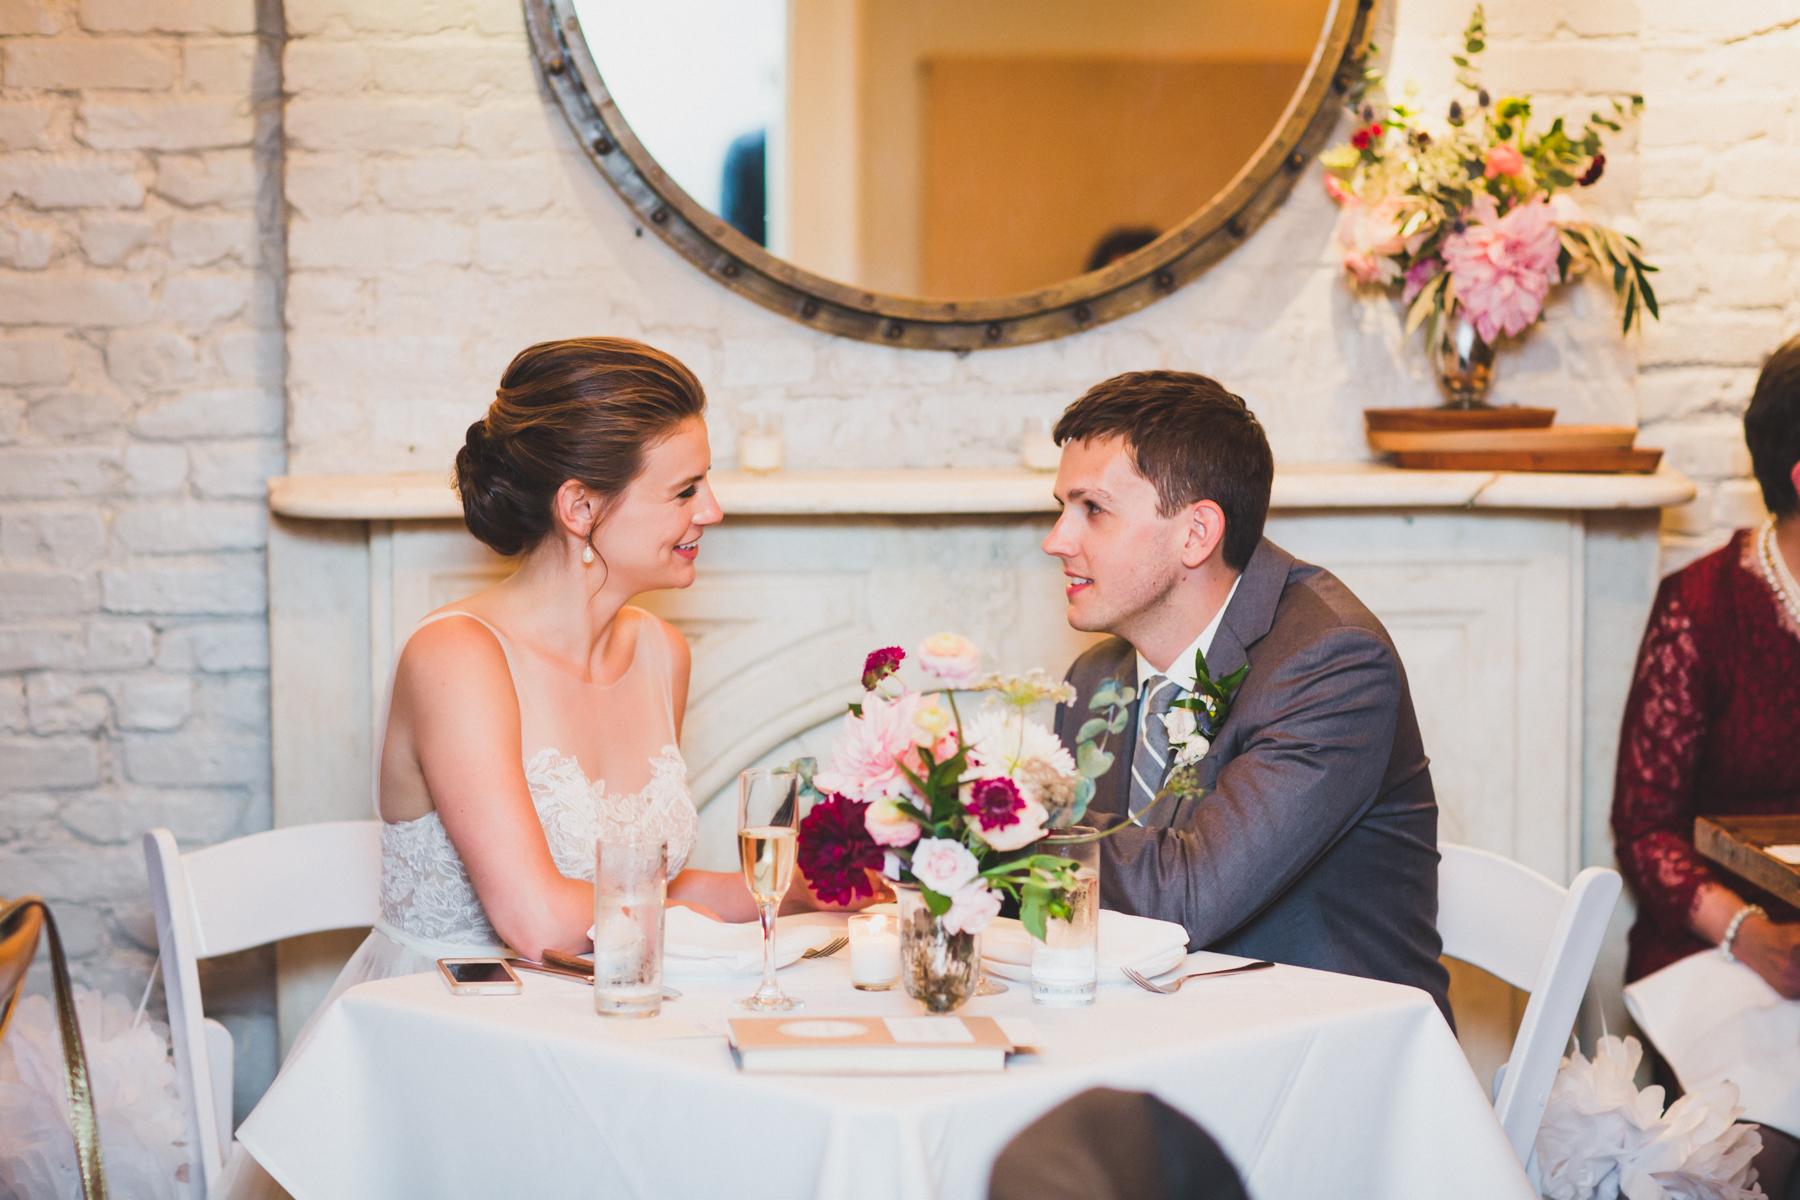 ICI-Restaurant-Fort-Greene-Brooklyn-Intimate-Documentary-Wedding-Photography-Elvira-Kalviste-86.jpg